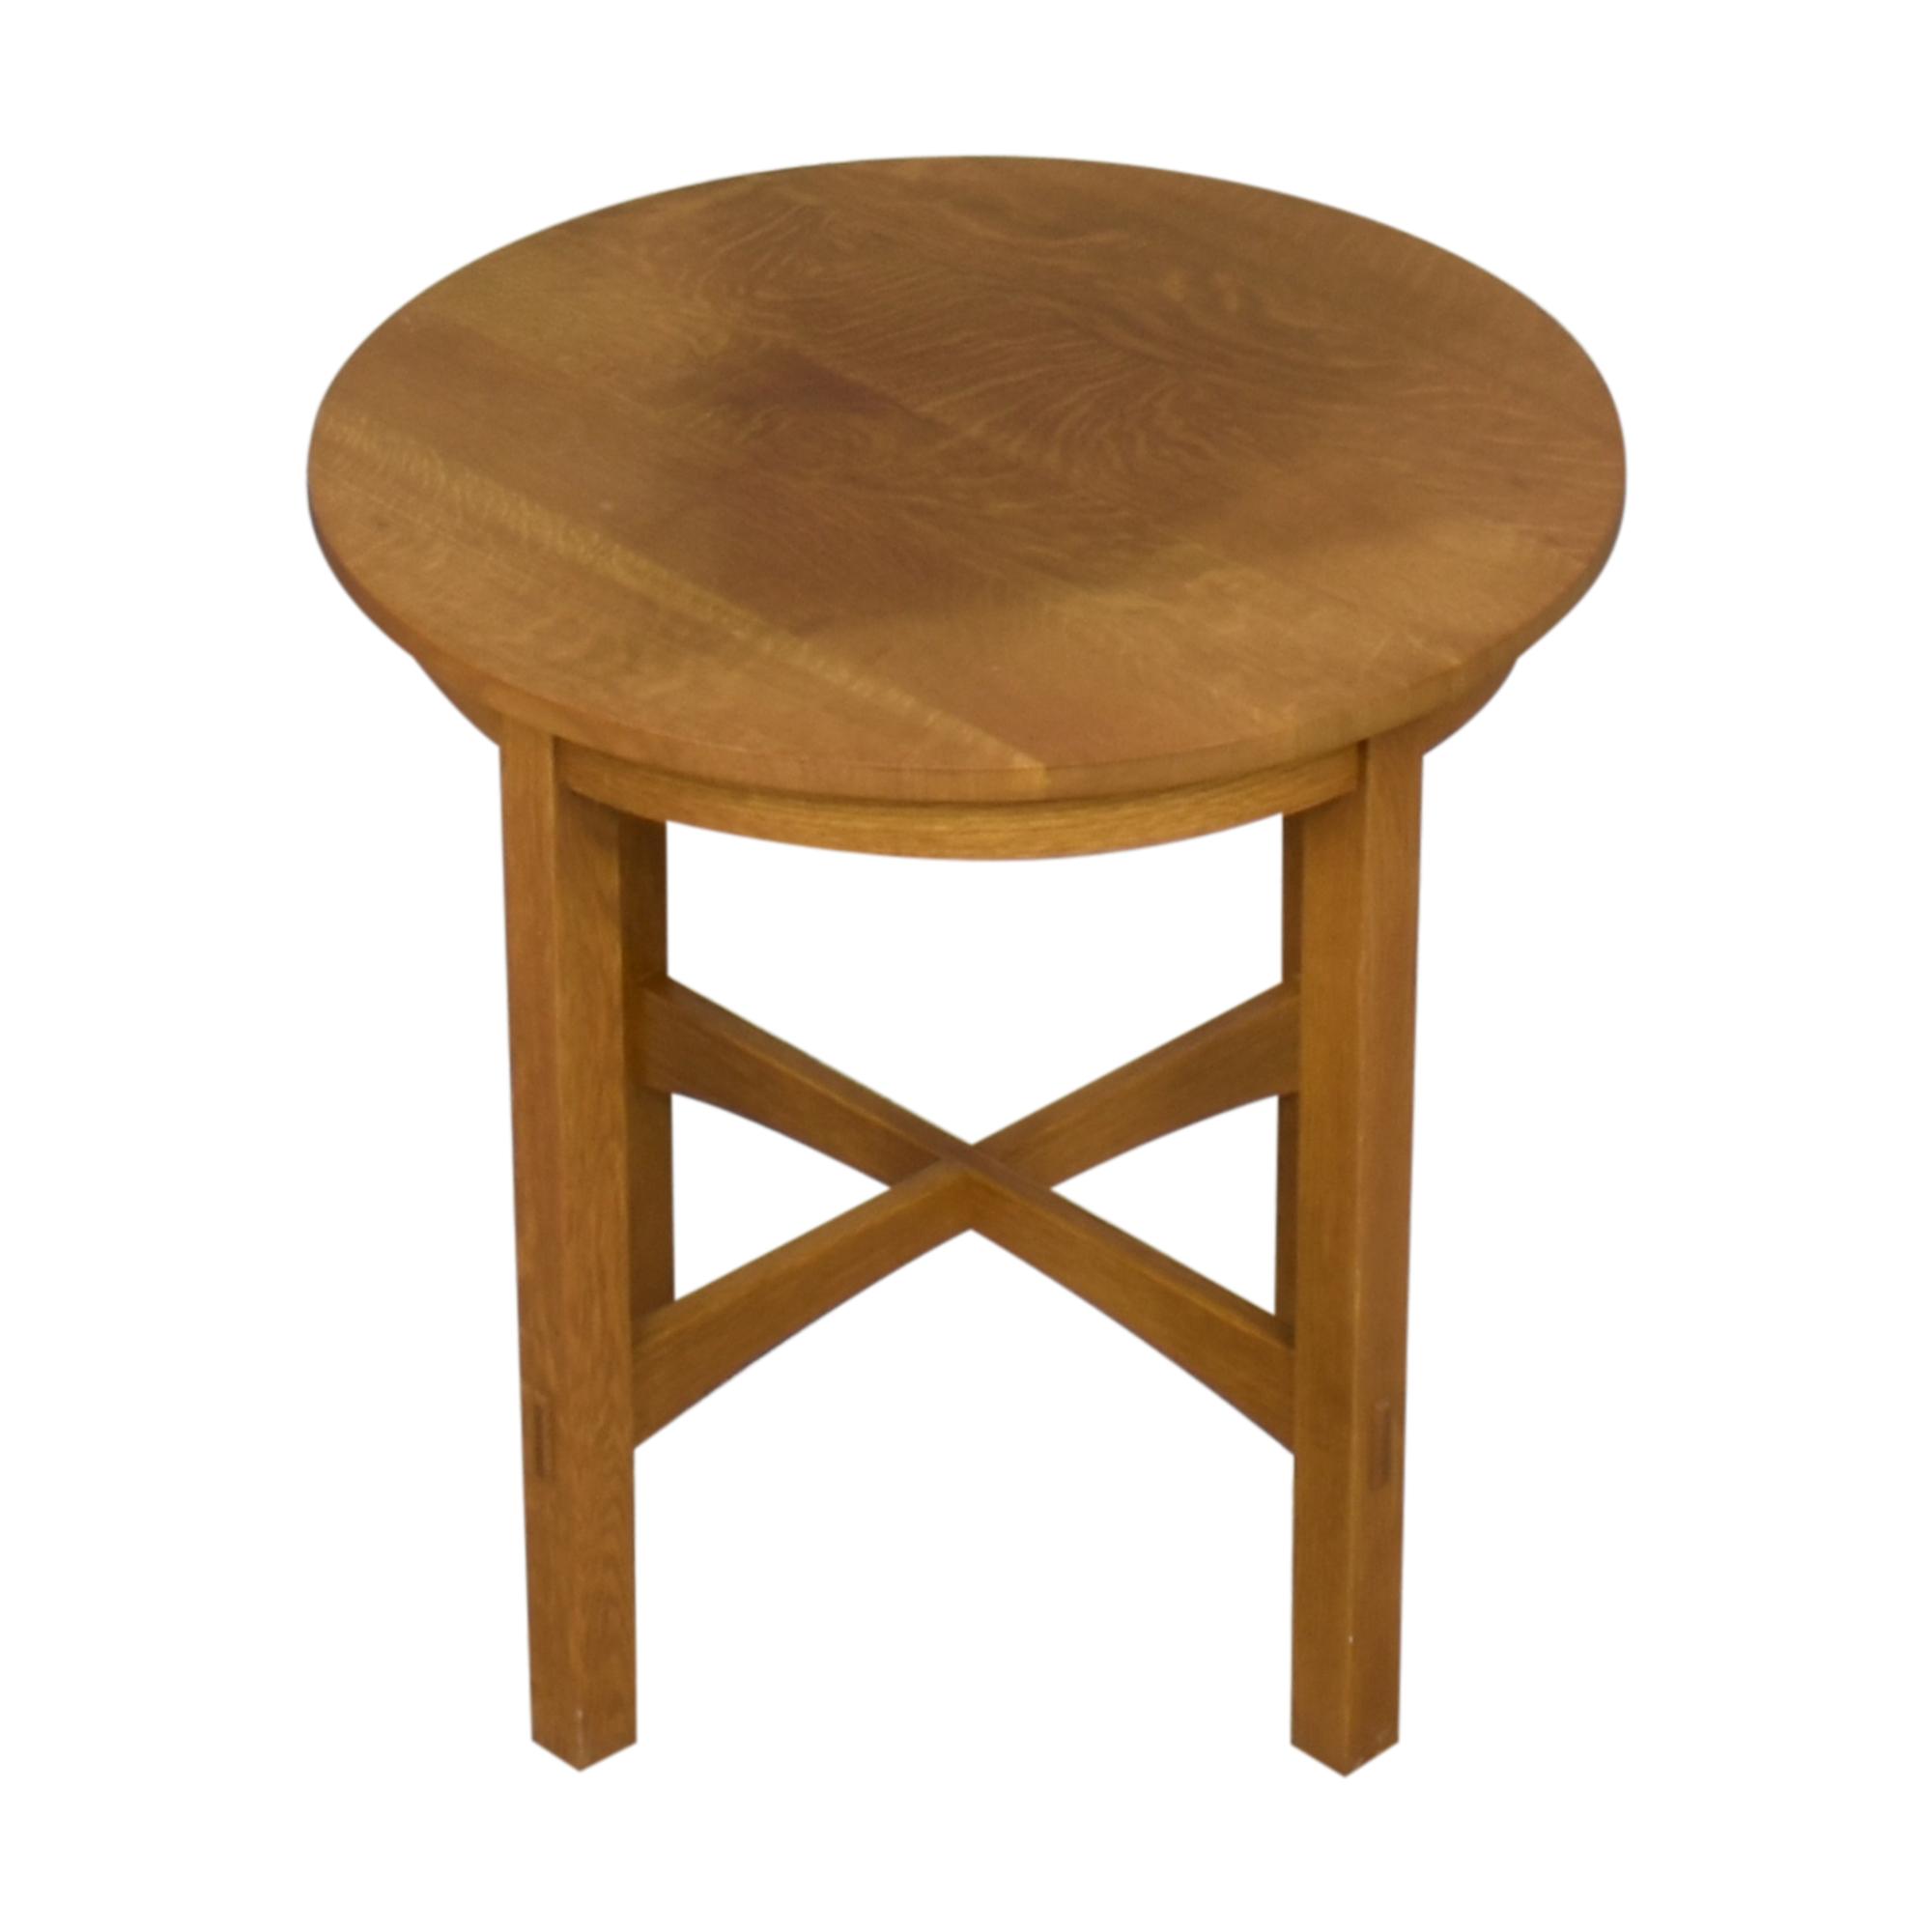 shop Stickley Furniture Round Side Table Stickley Furniture Tables